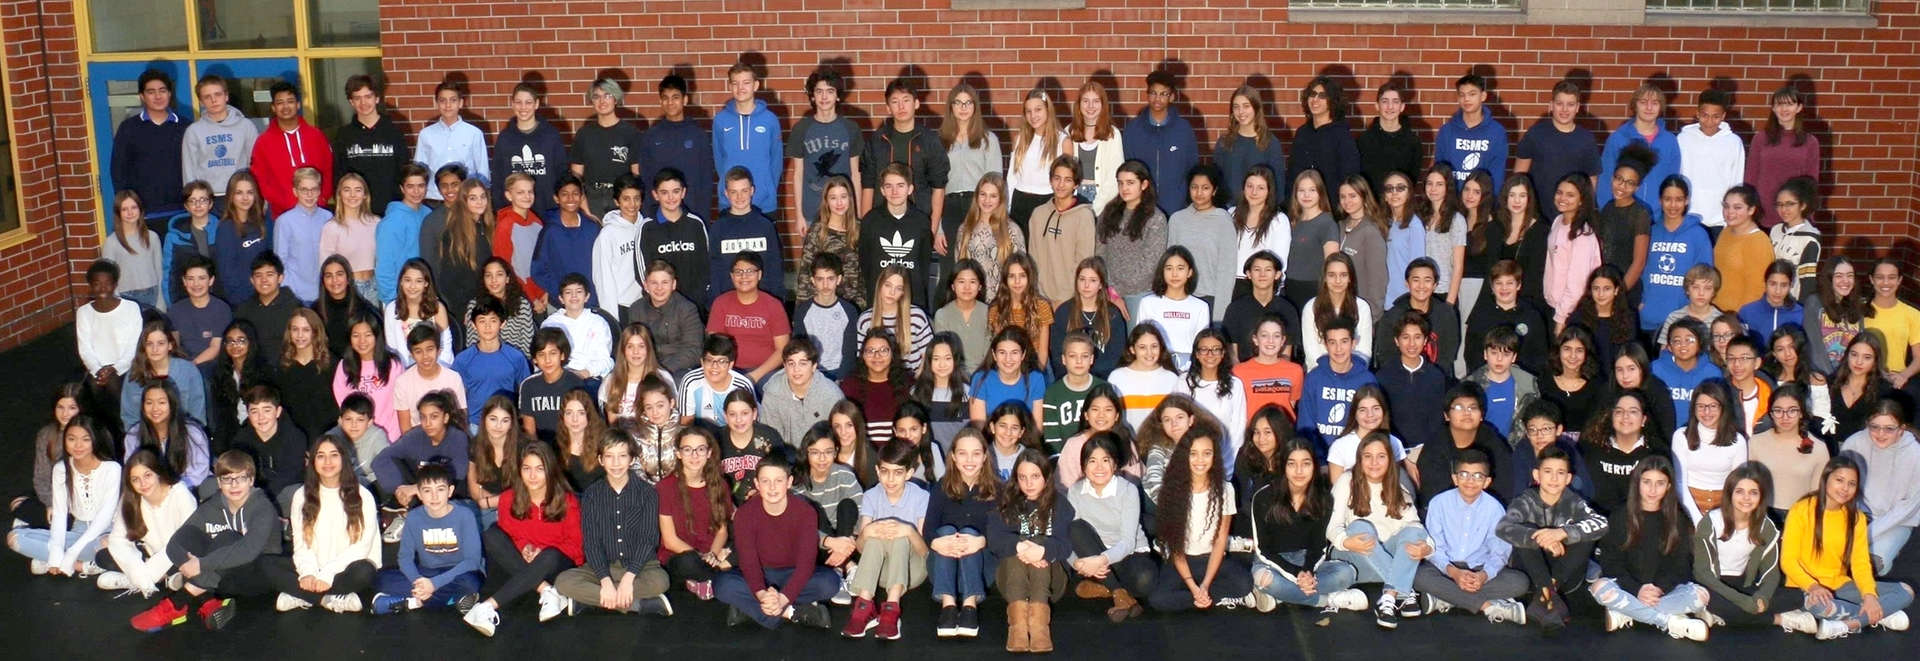 Photo- Class of 2020